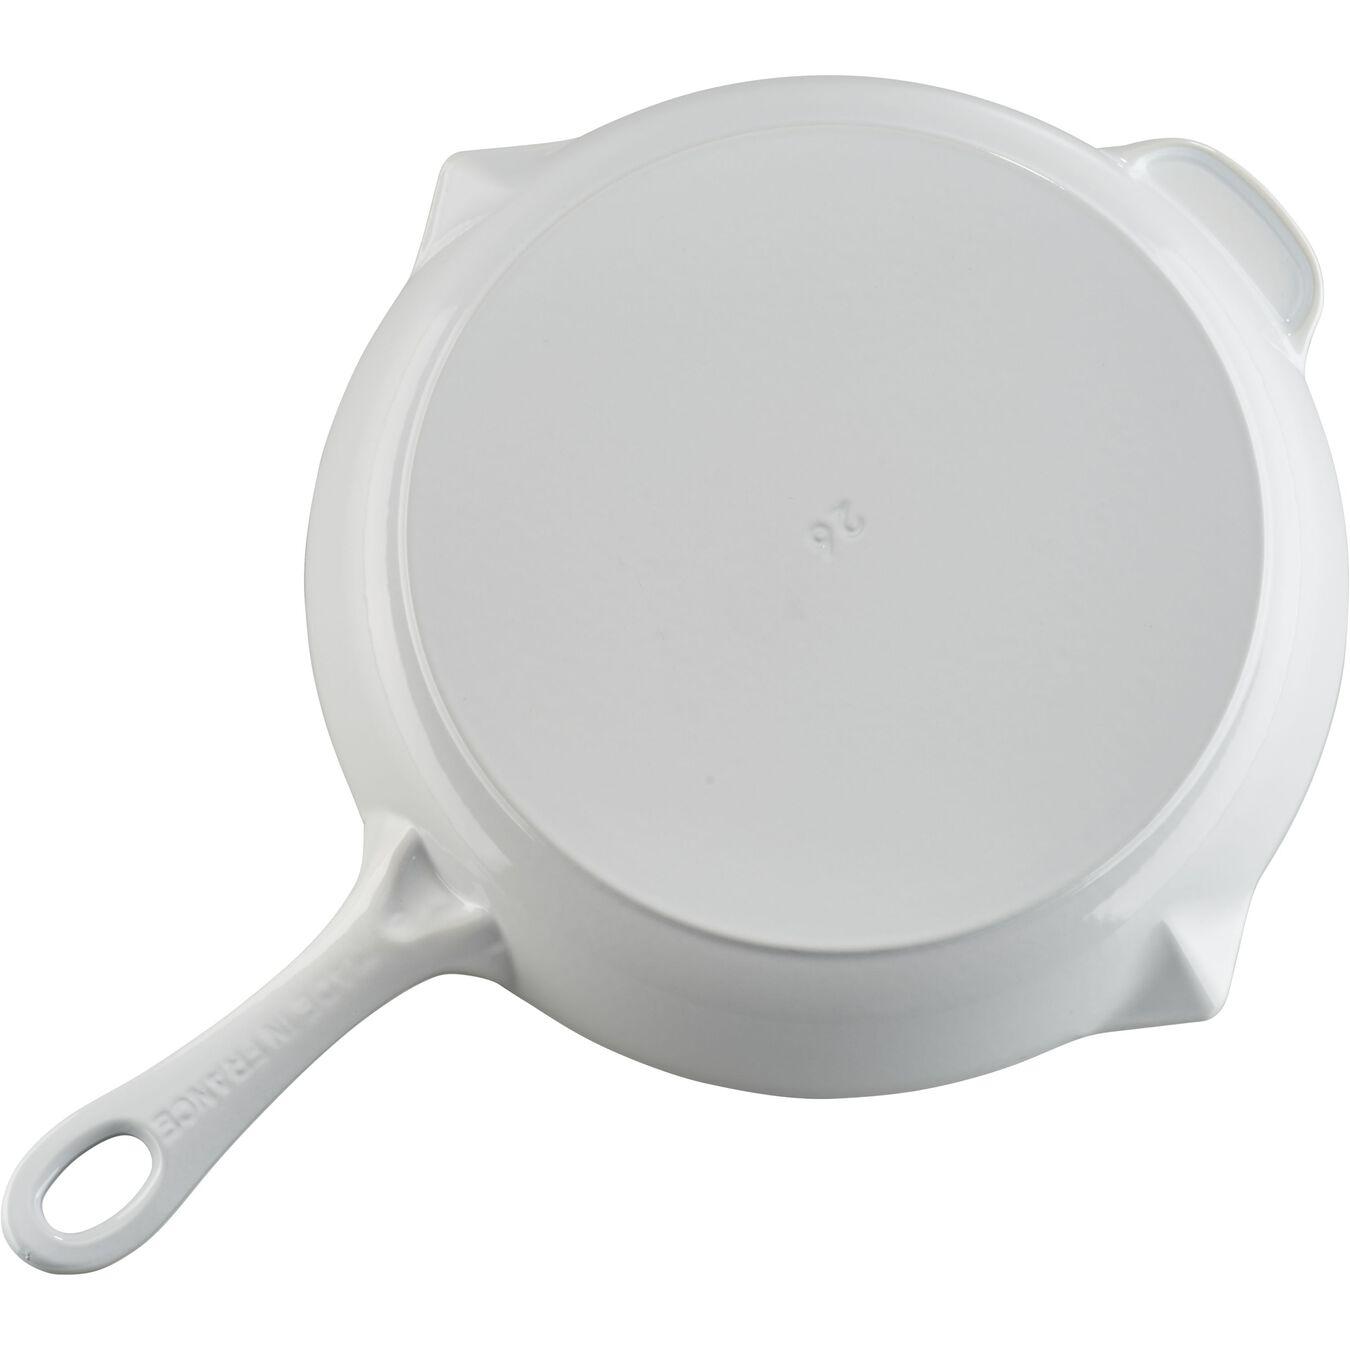 10-inch, Fry Pan, white,,large 3